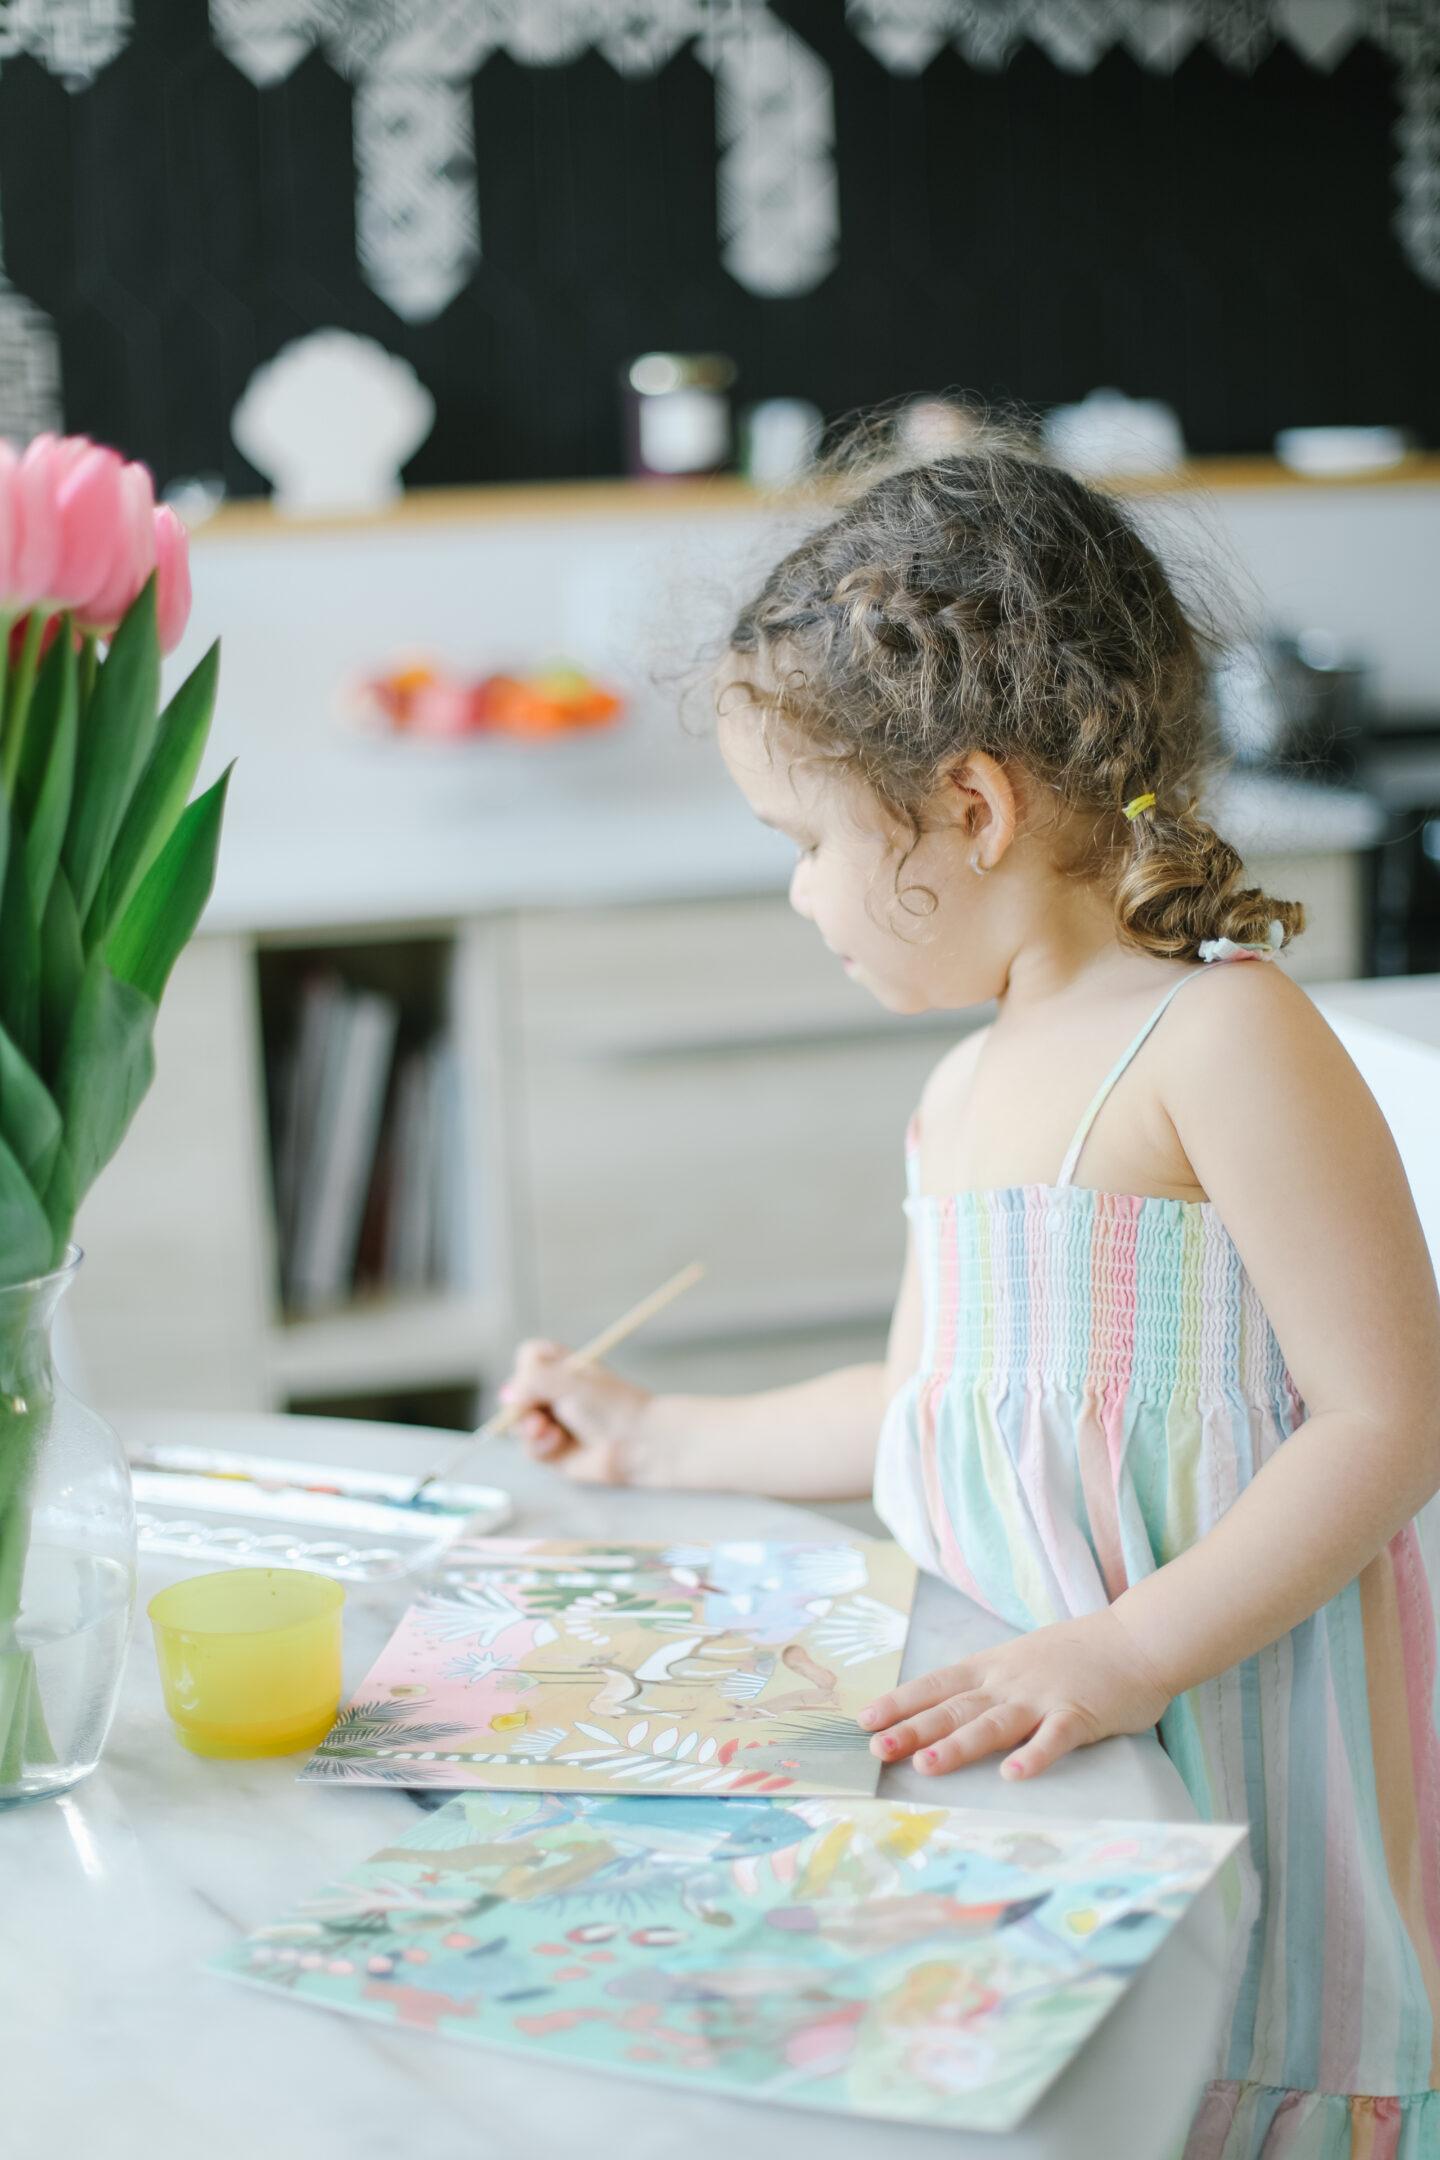 Print your kids draws into books